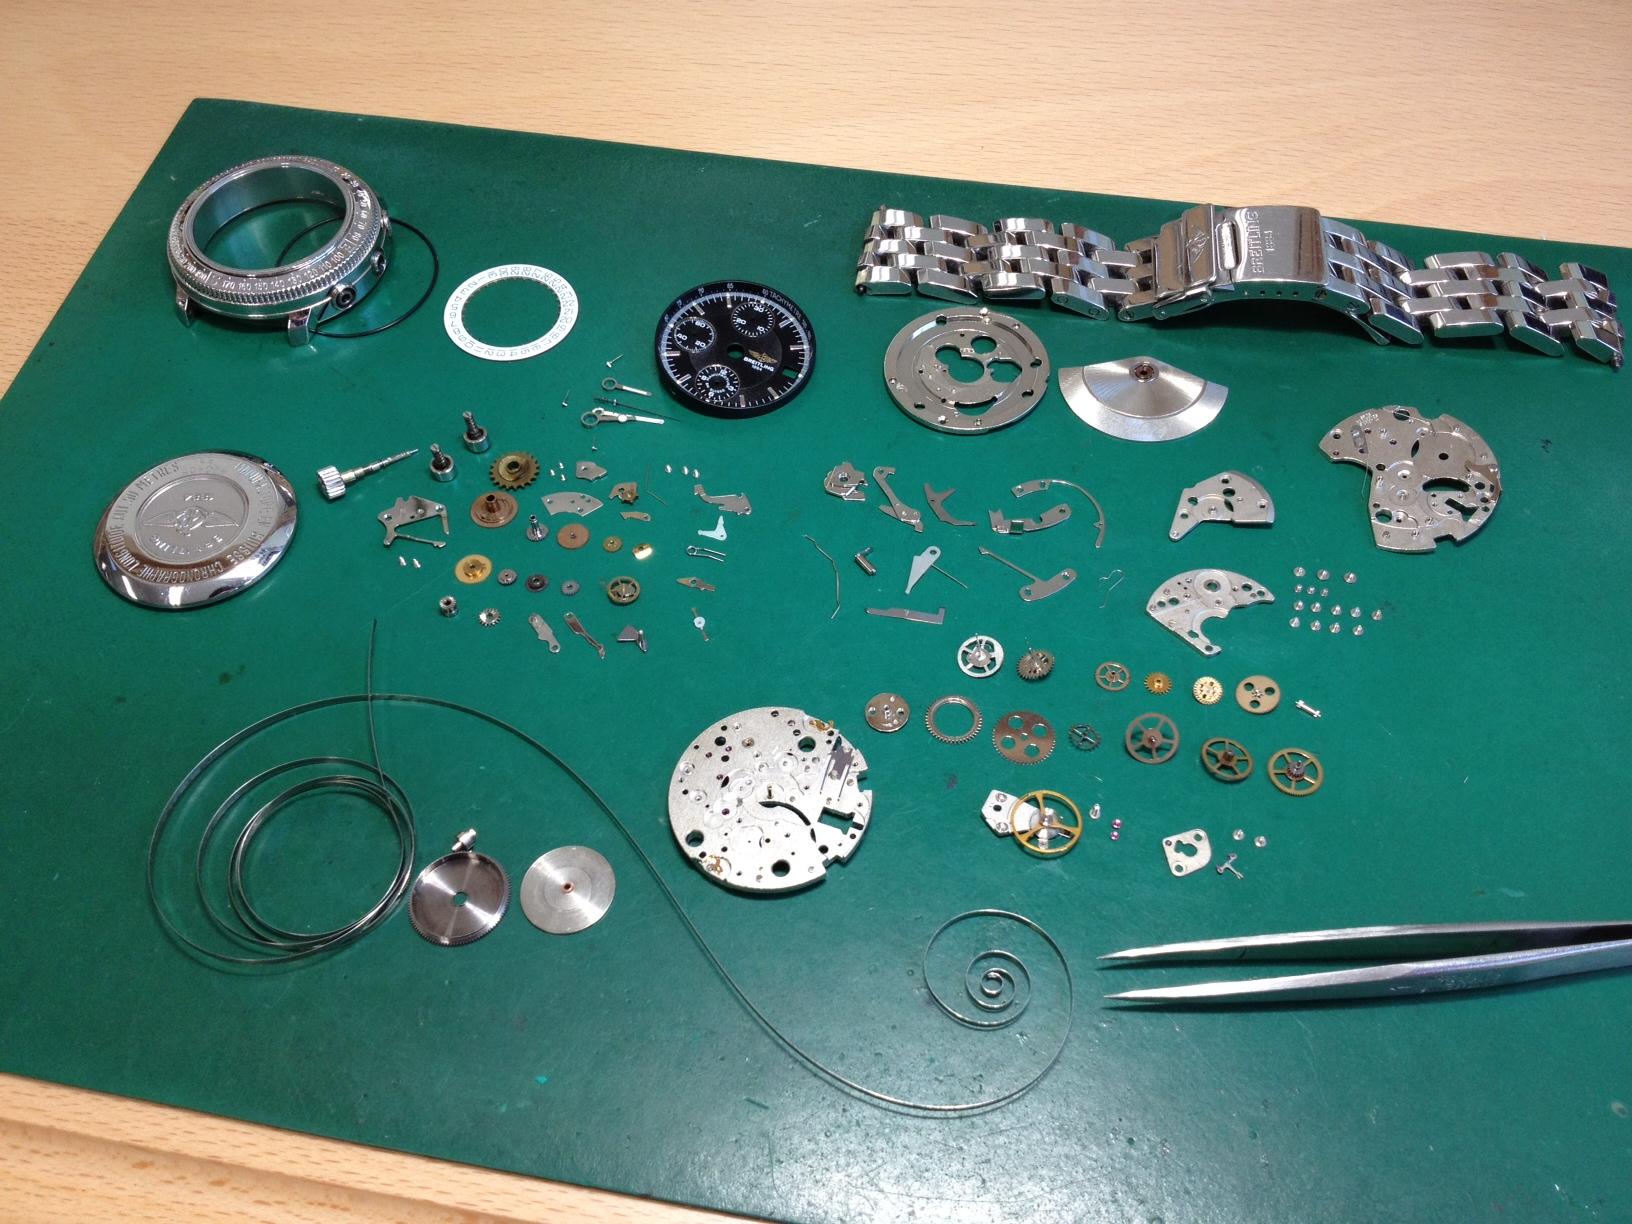 ROLEX OMEGA お問い合わせ 時計 修理 電池交換 静岡県 藤枝市